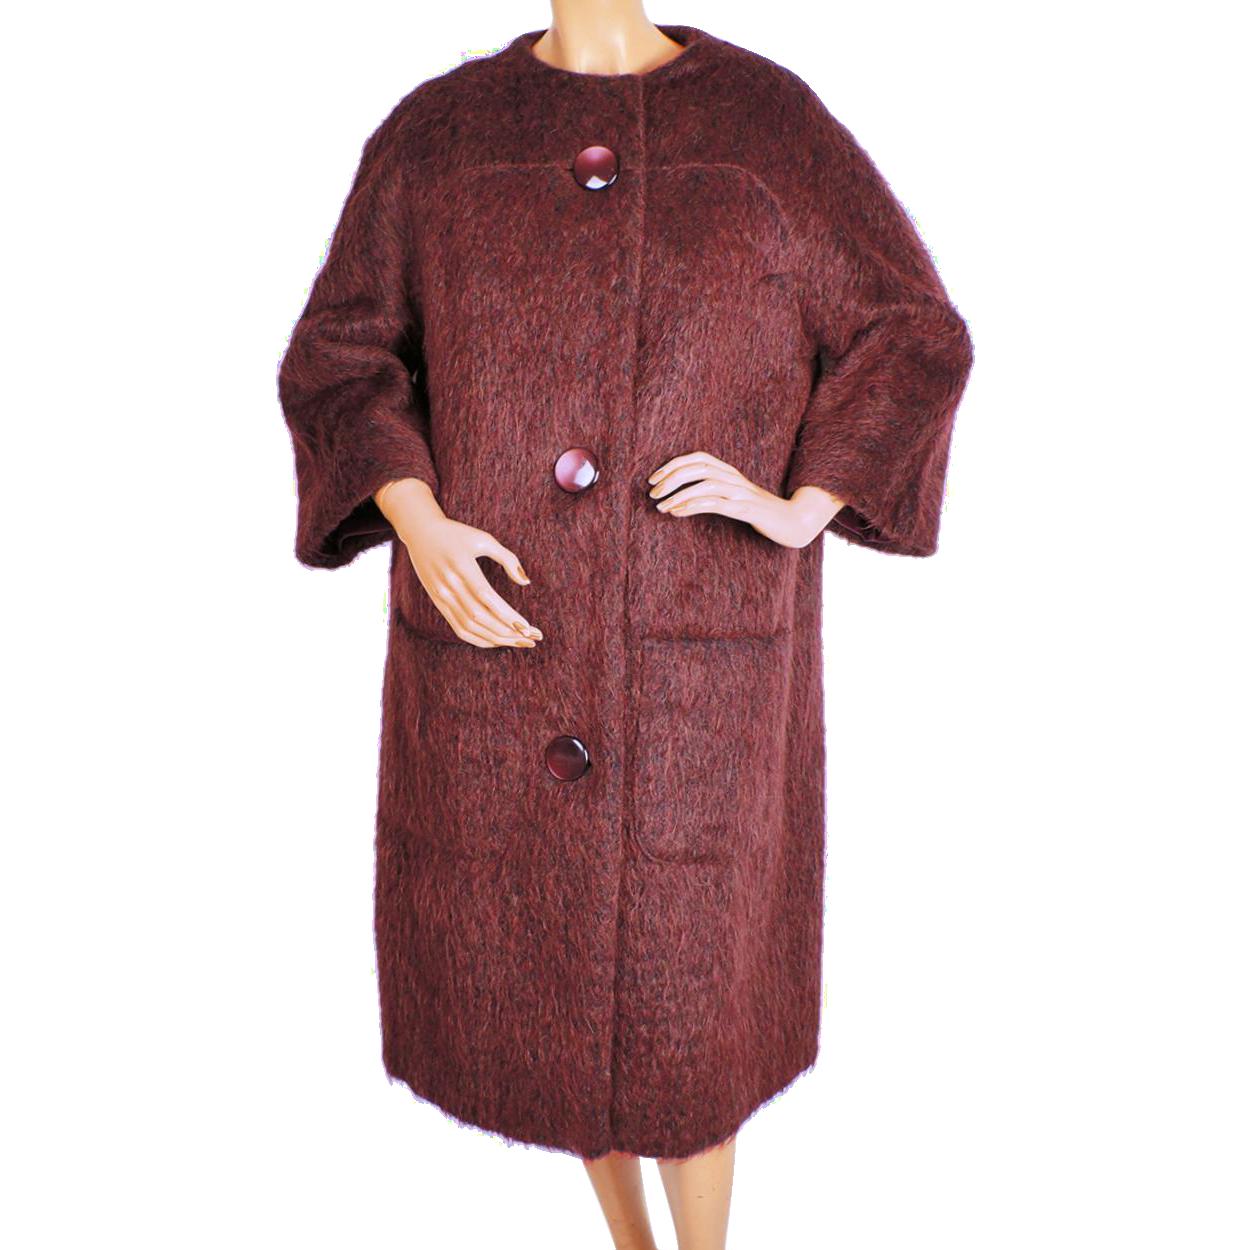 Vintage 1960s Mohair Wool Coat Rust Red Colour Ladies Size L